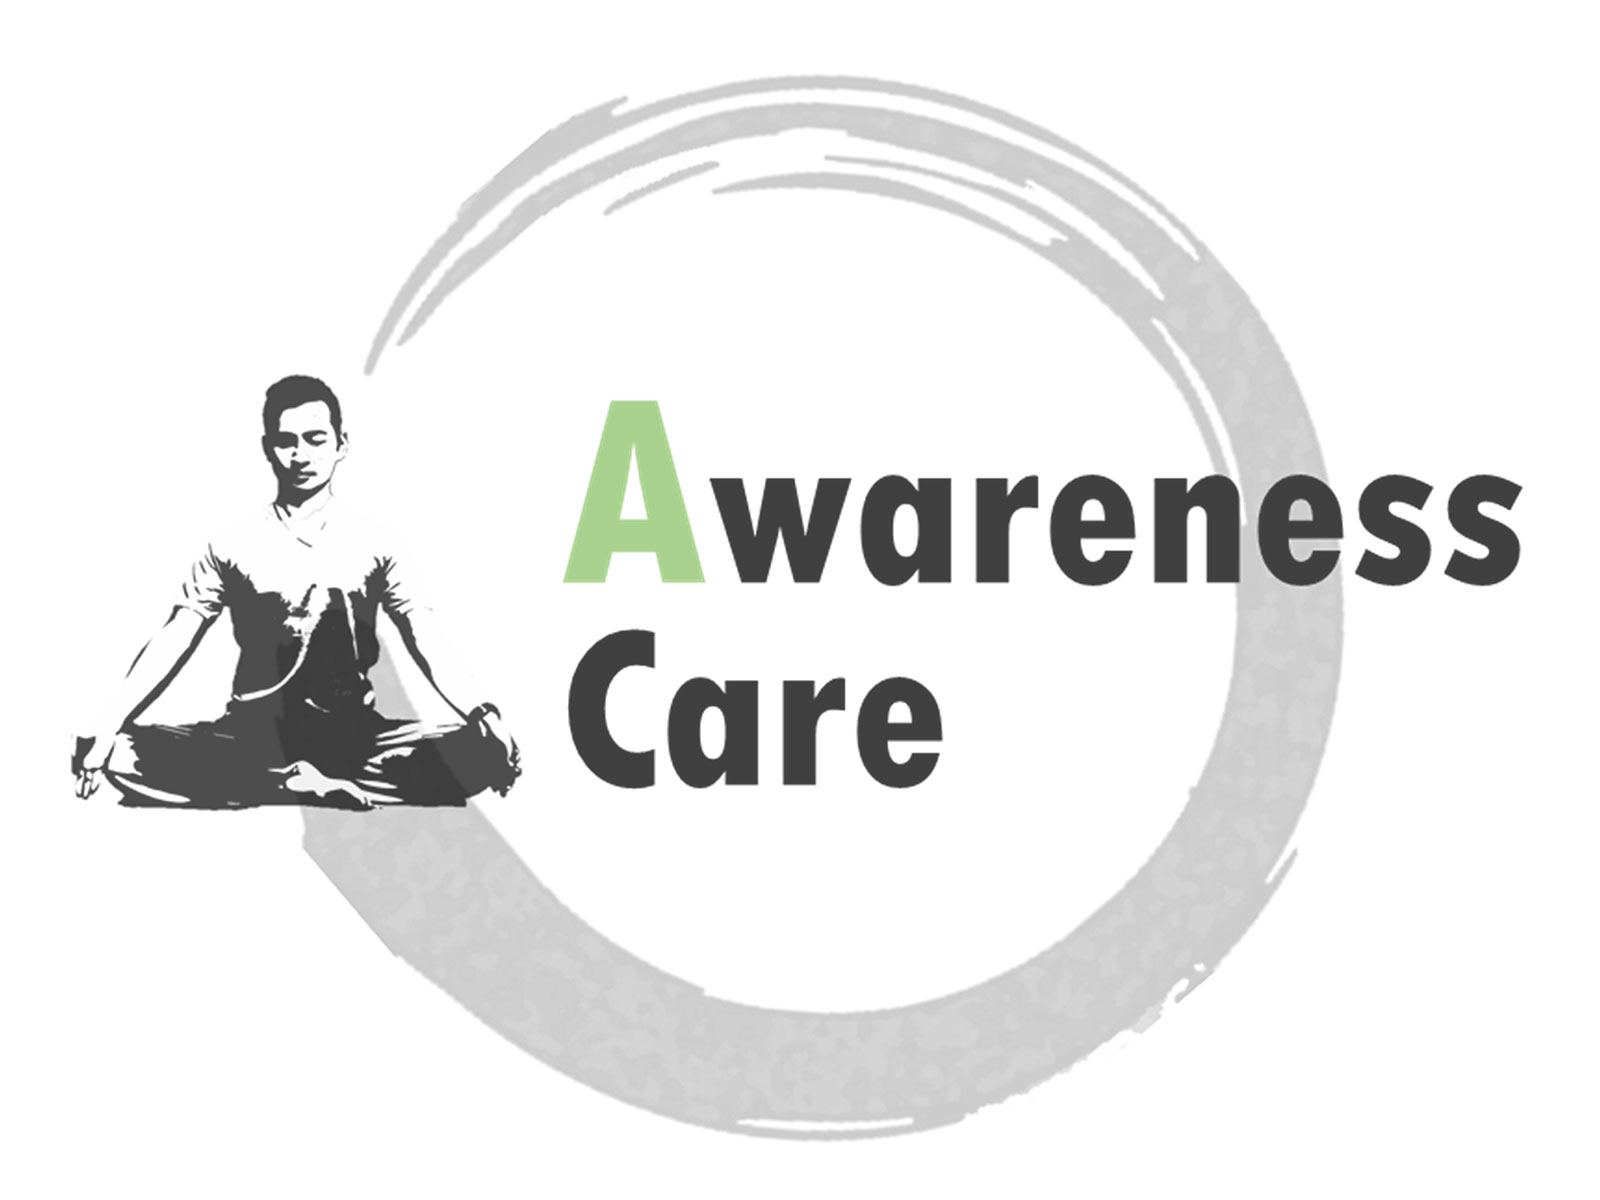 Awareness care アウェアネスケア